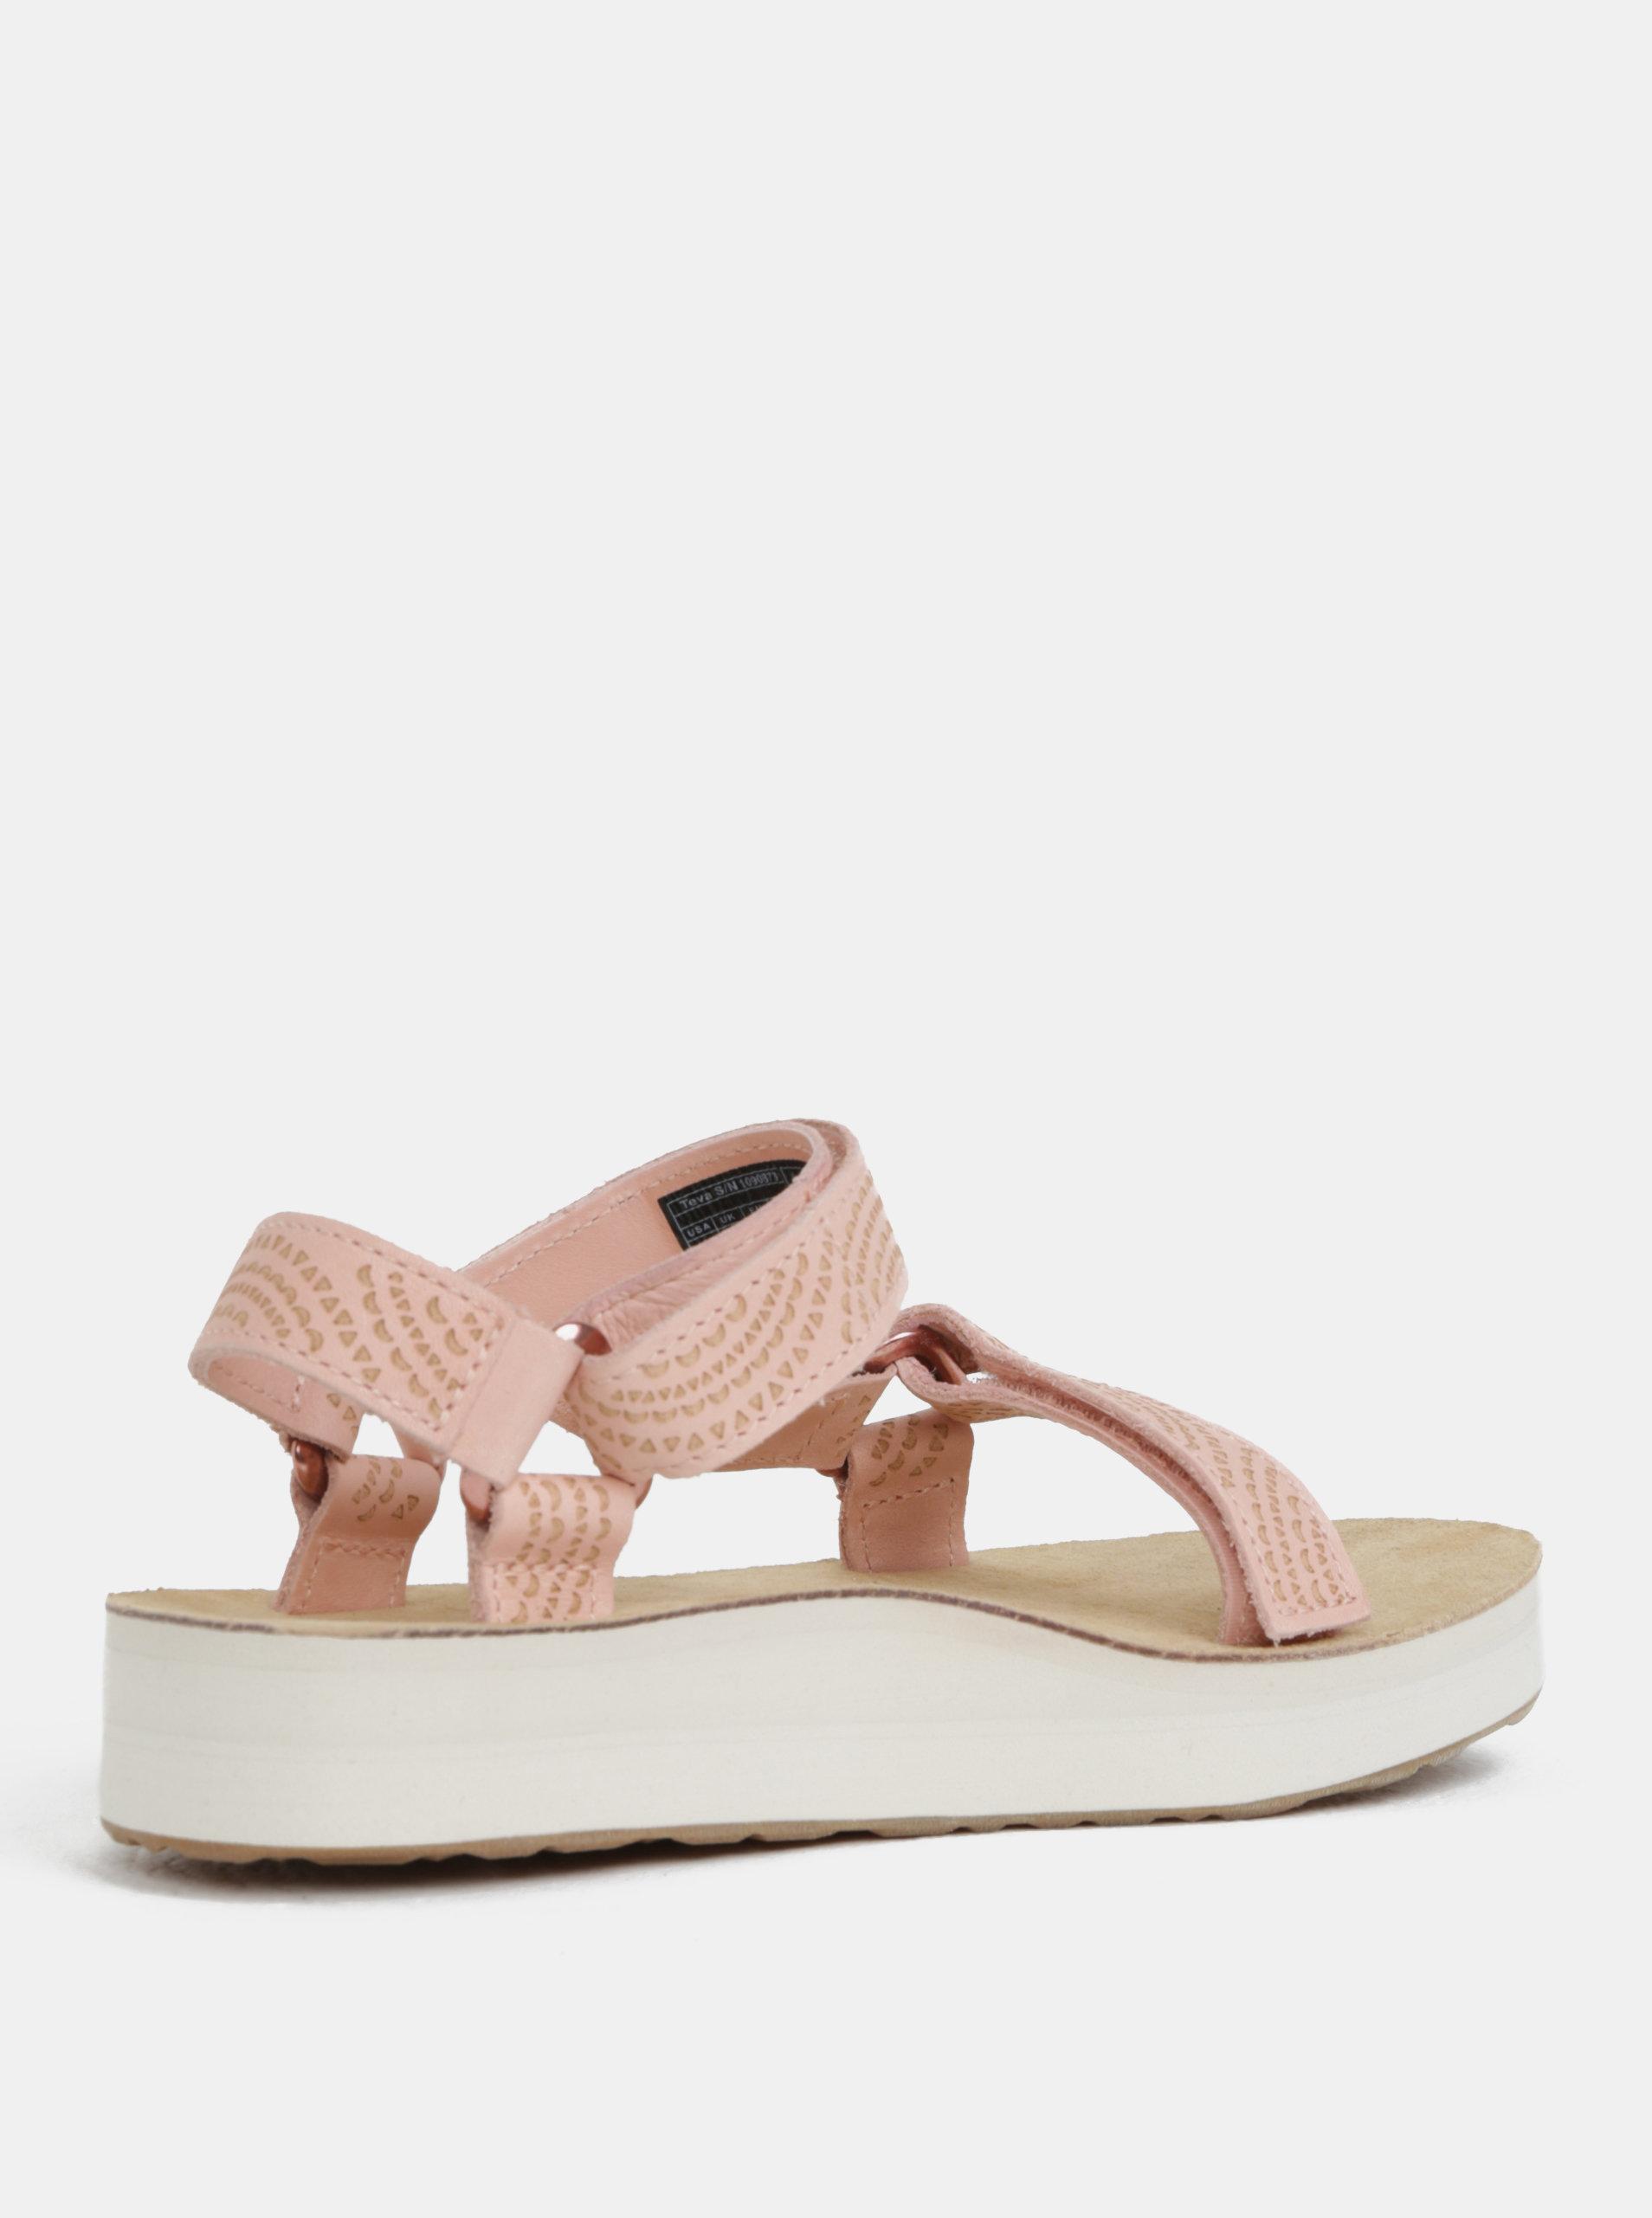 Světle růžové dámské kožené vzorované sandály na platformě Teva ... b614b83200